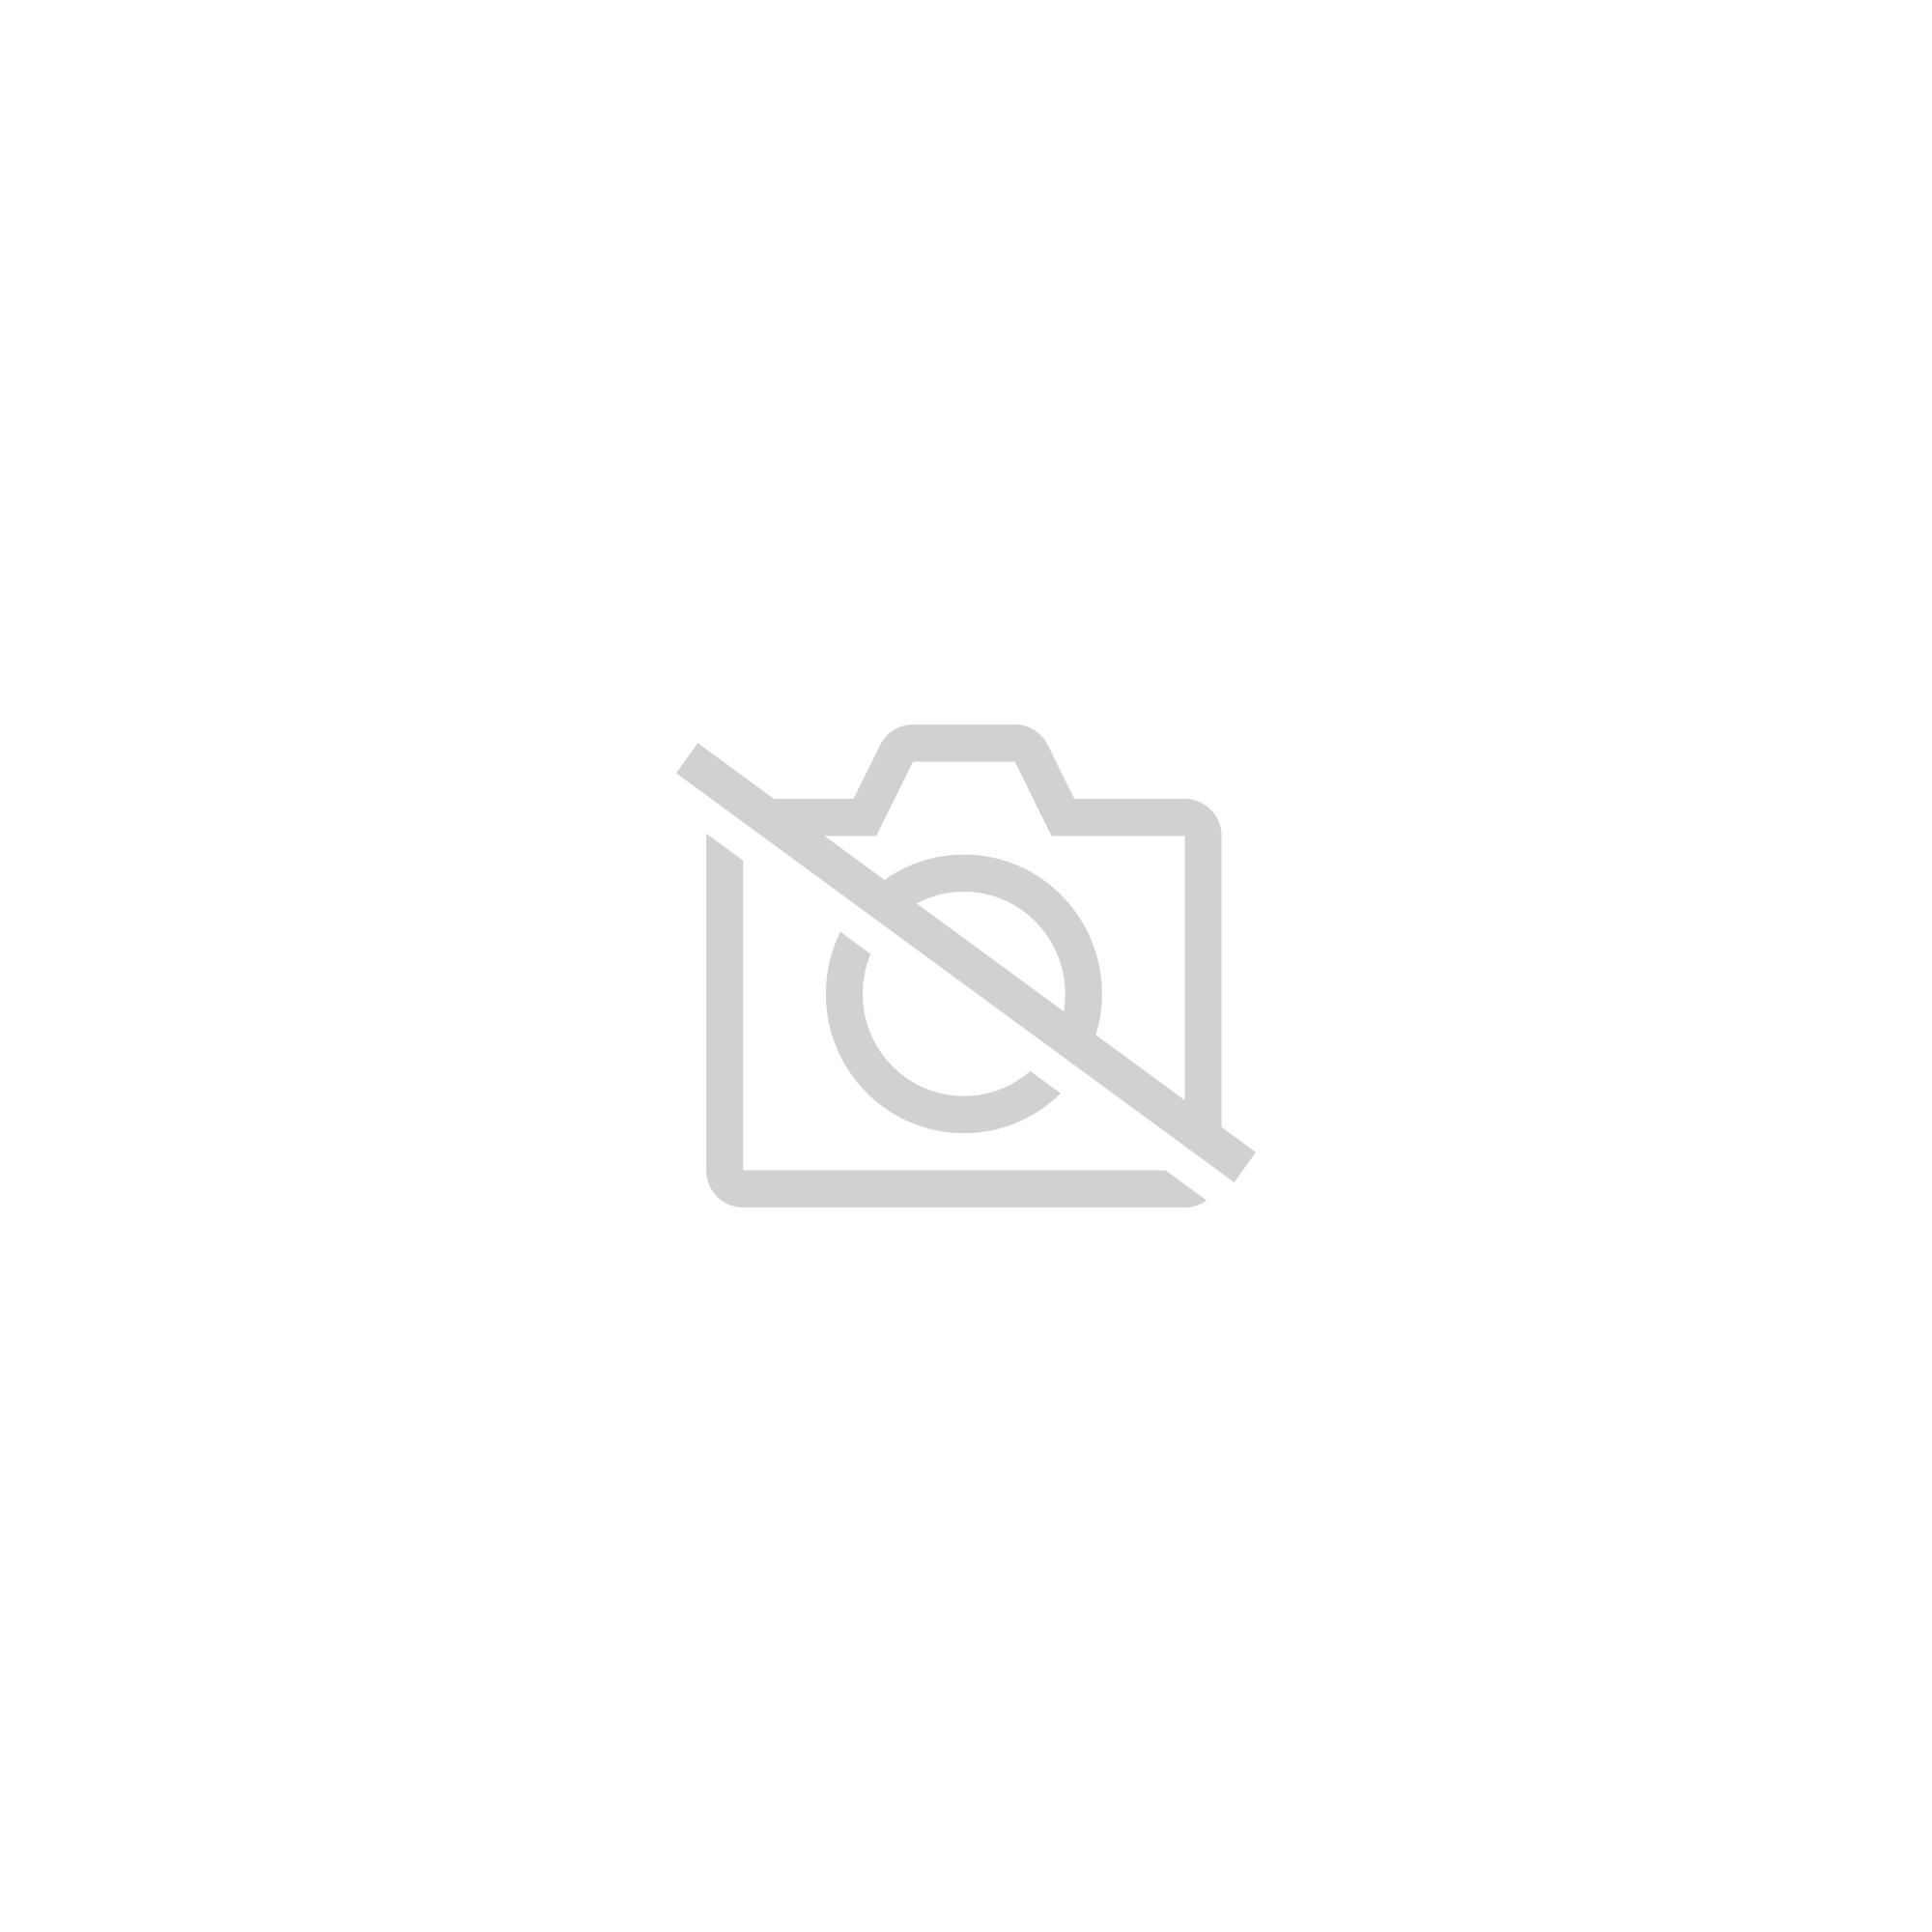 Nolim Nolimbook+ by Carrefour - liseuse 6